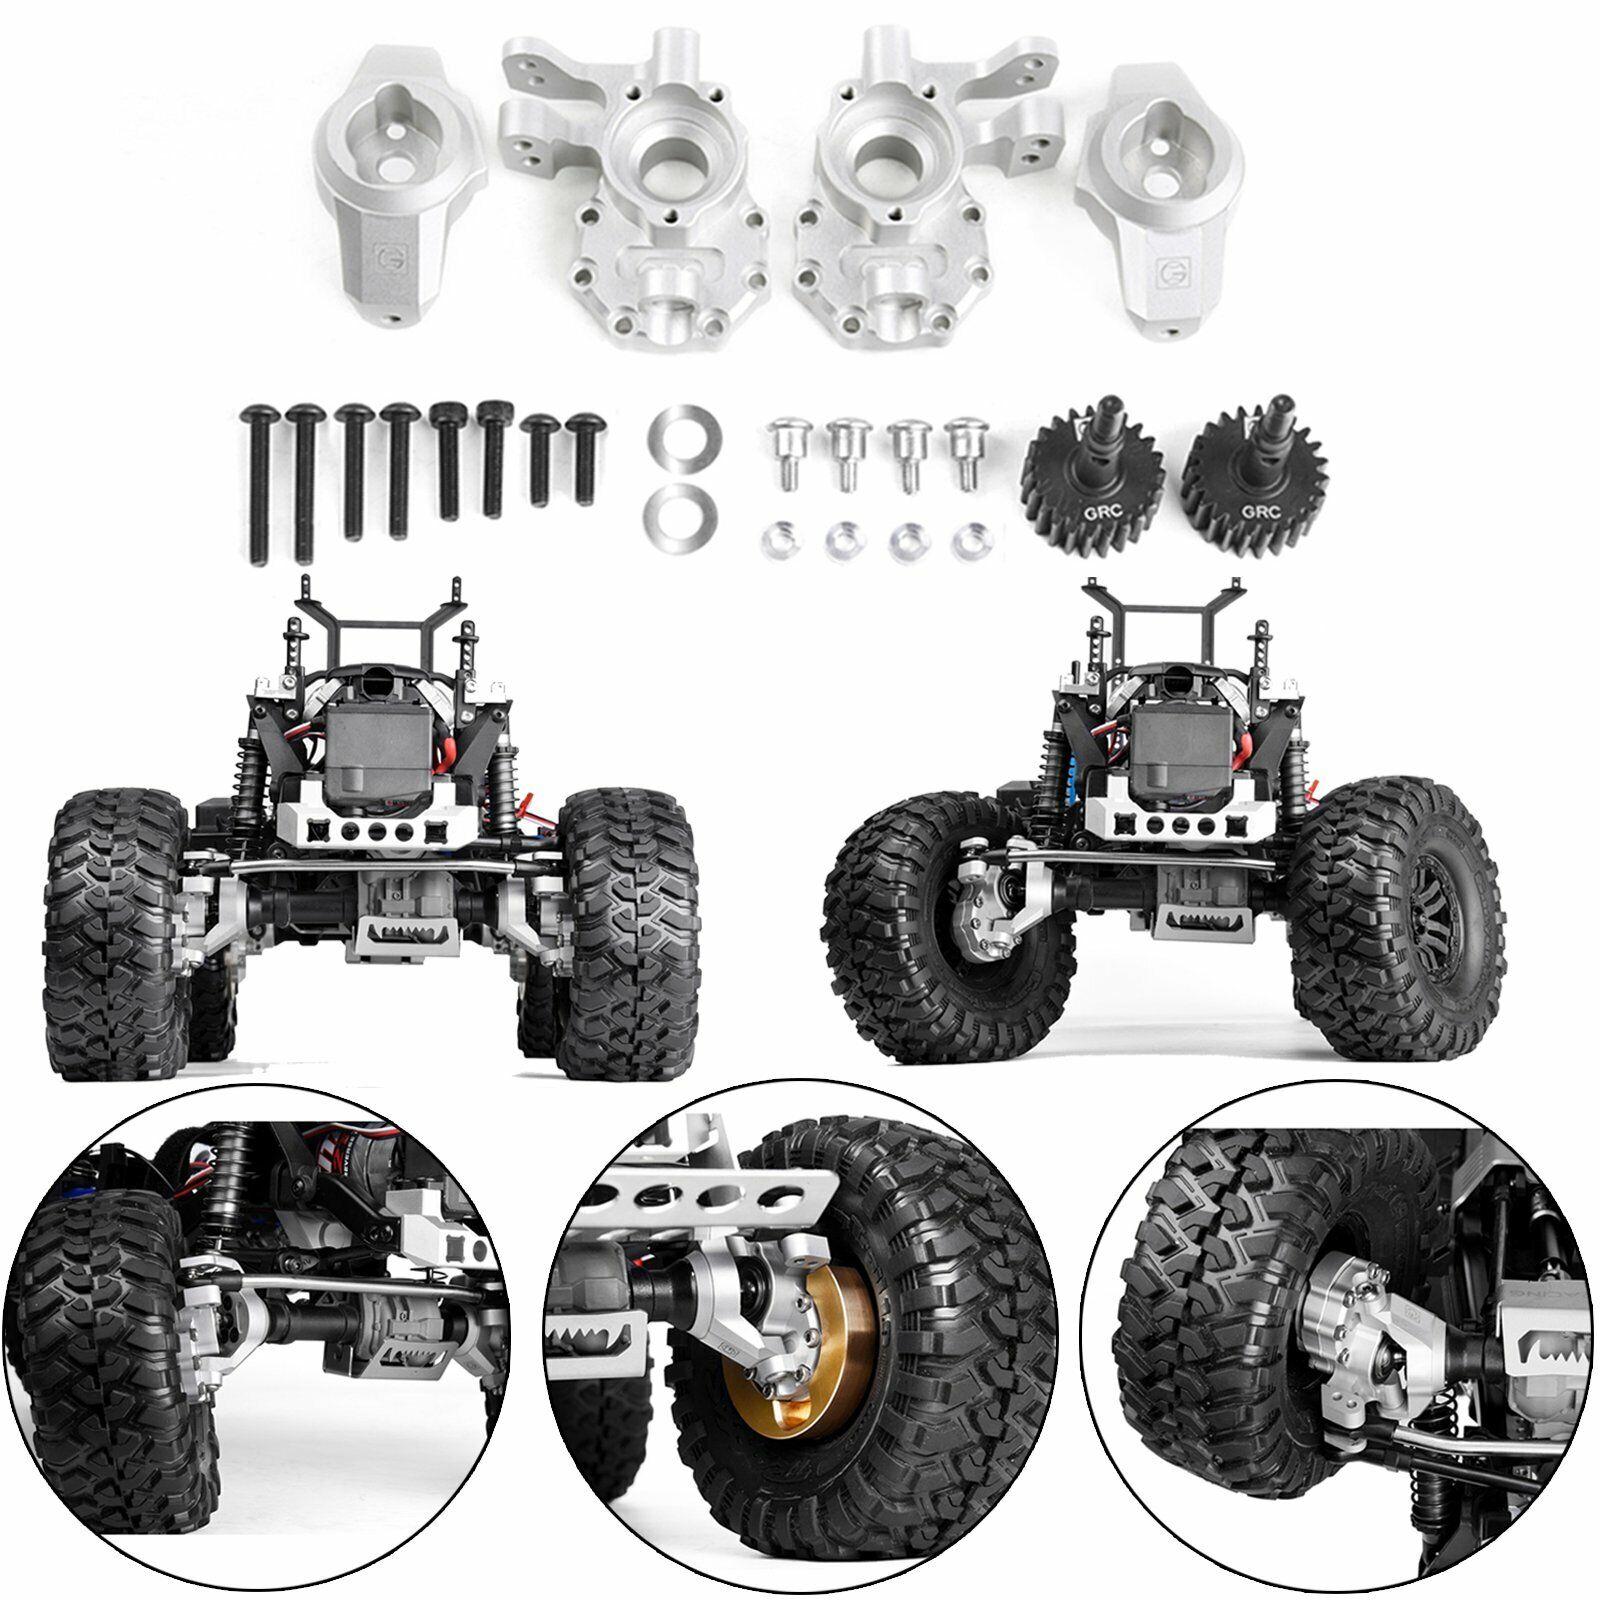 Bloque de hundimiento Volante Rueda De Metal C Hub Kit para para 1 10 Traxxas TRX4 RC Coche